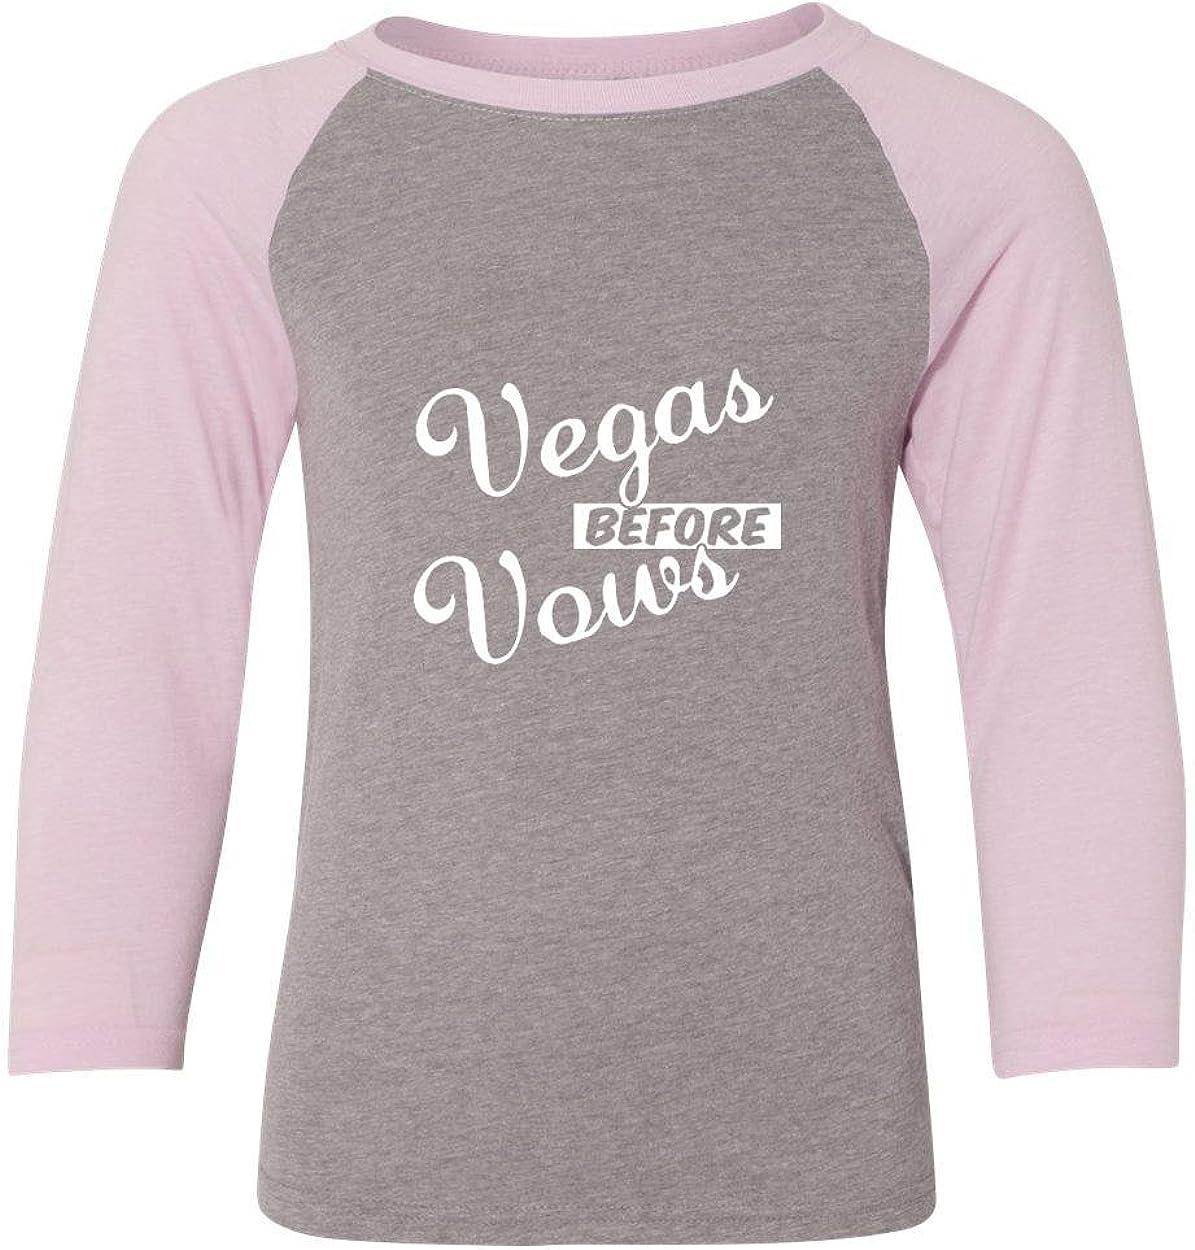 Marky G apparel Boys Vegas Before Vows T-Shirt